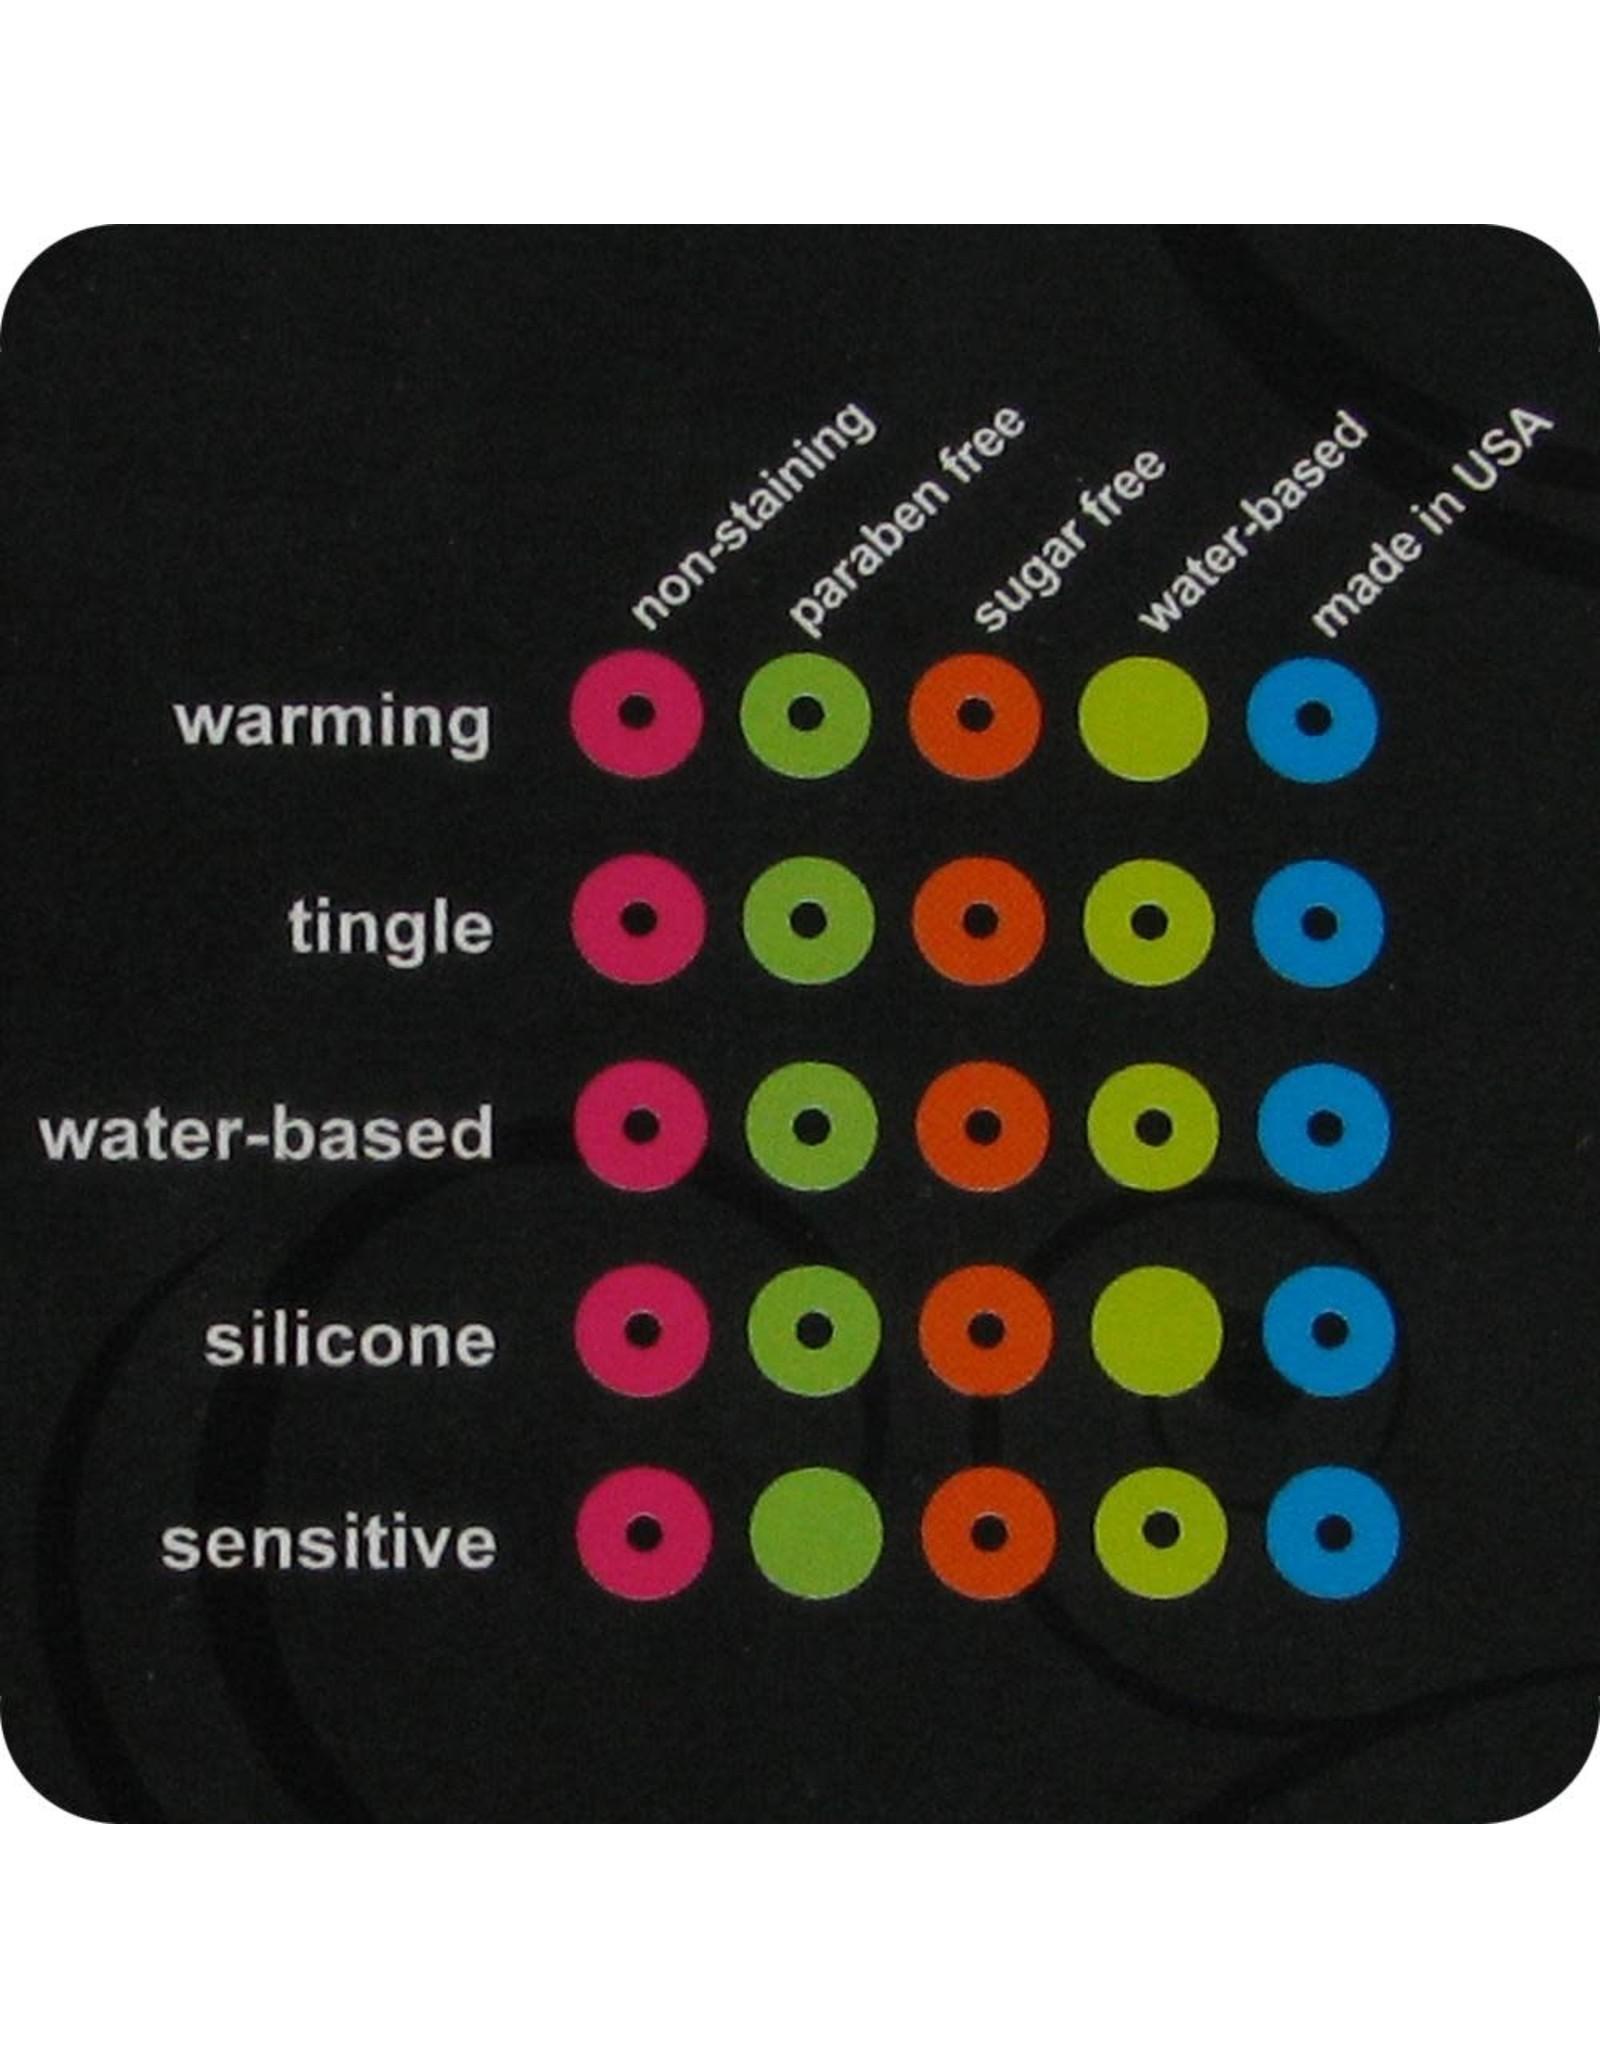 Doc Johnson Mood Lube - Warming - 4 oz